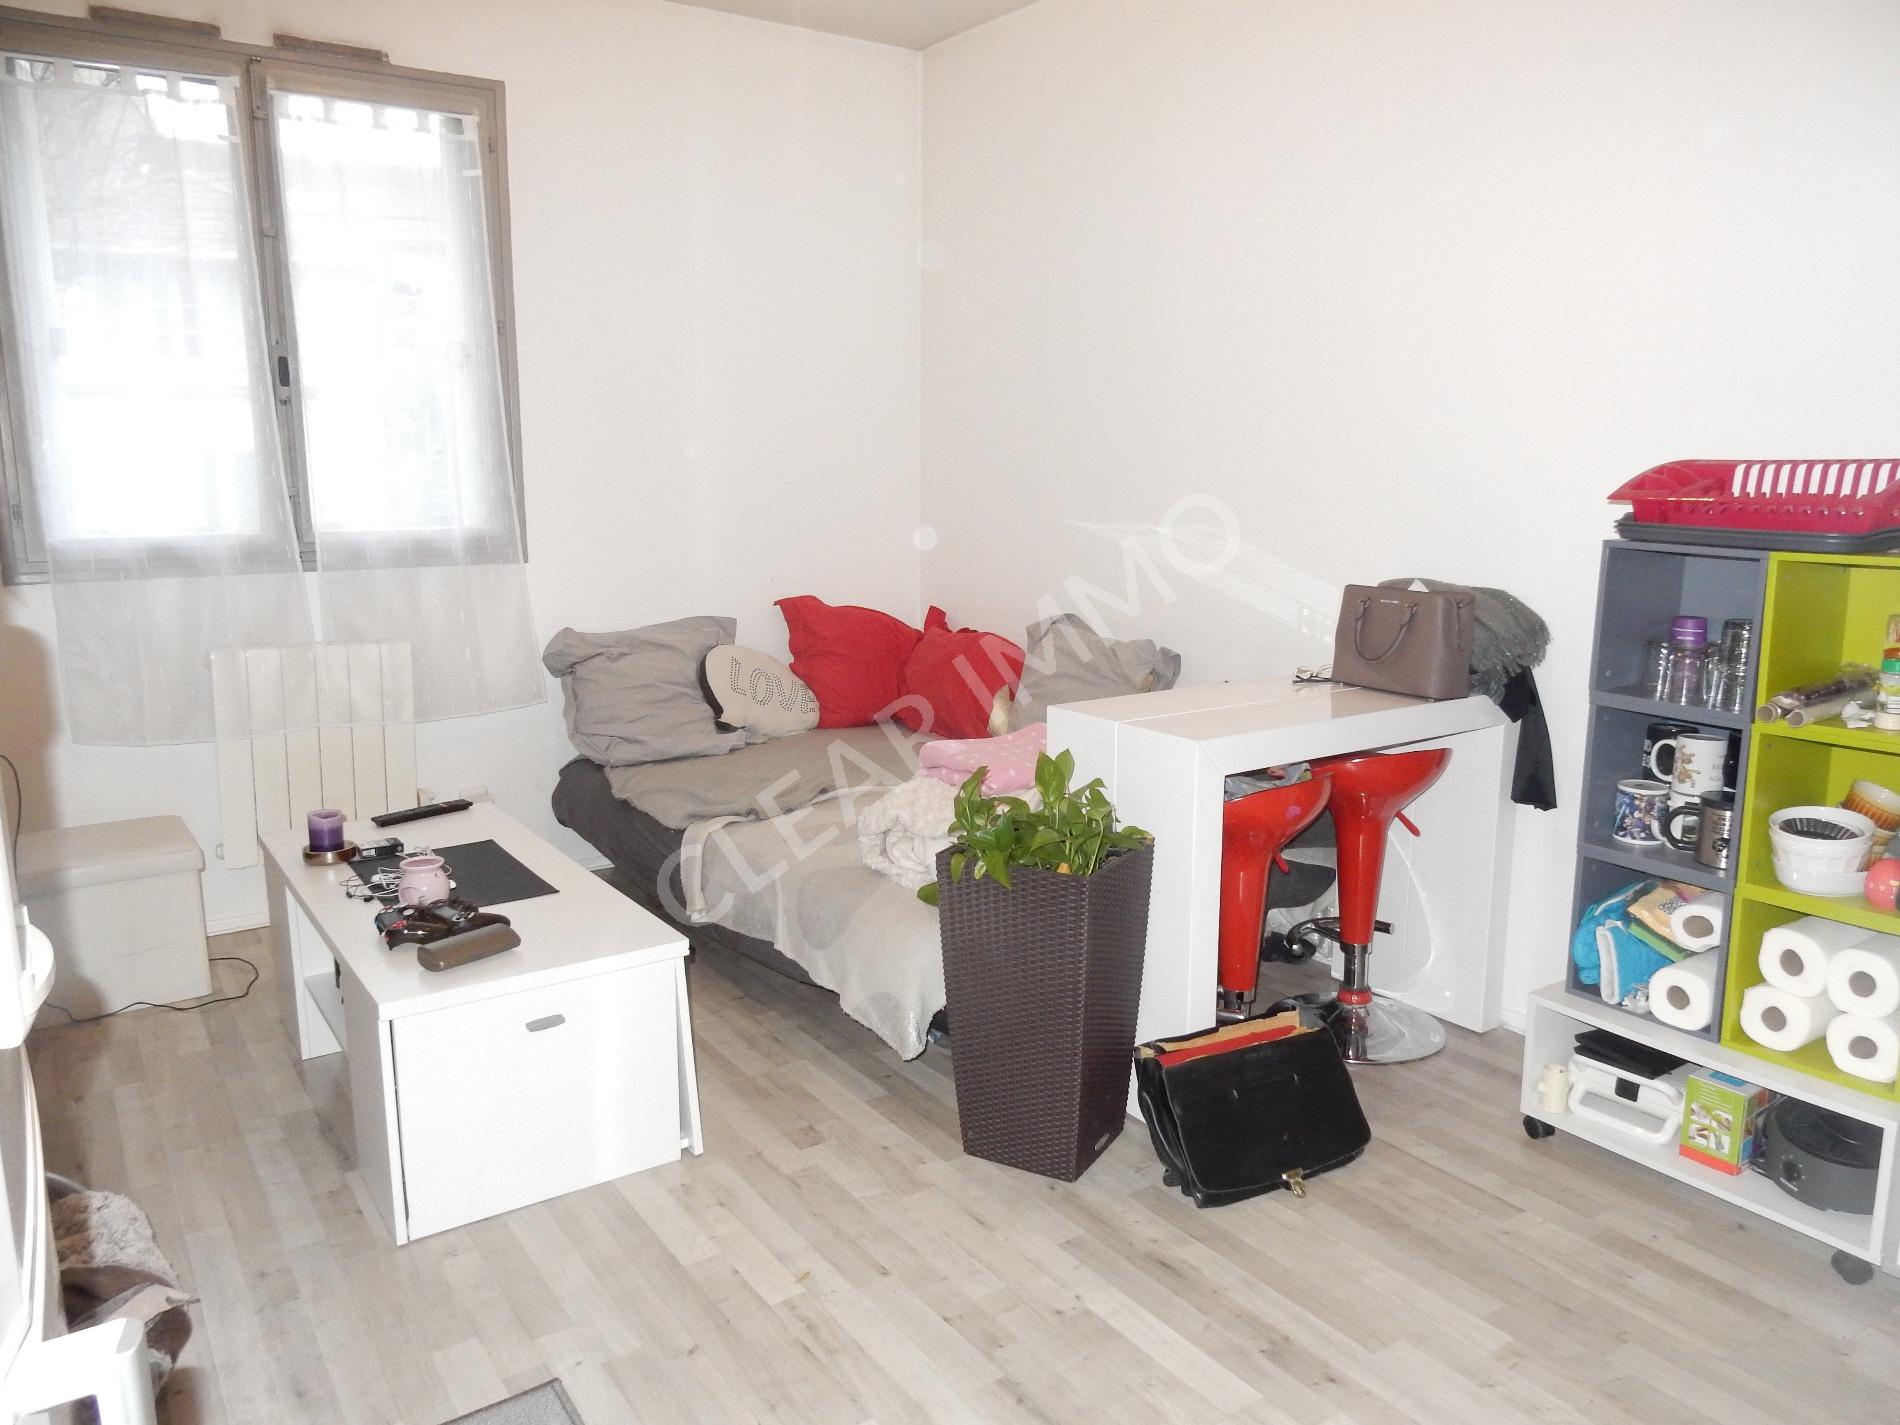 Annonce vente appartement montigny l s metz 57950 40 for Annonce vente appartement